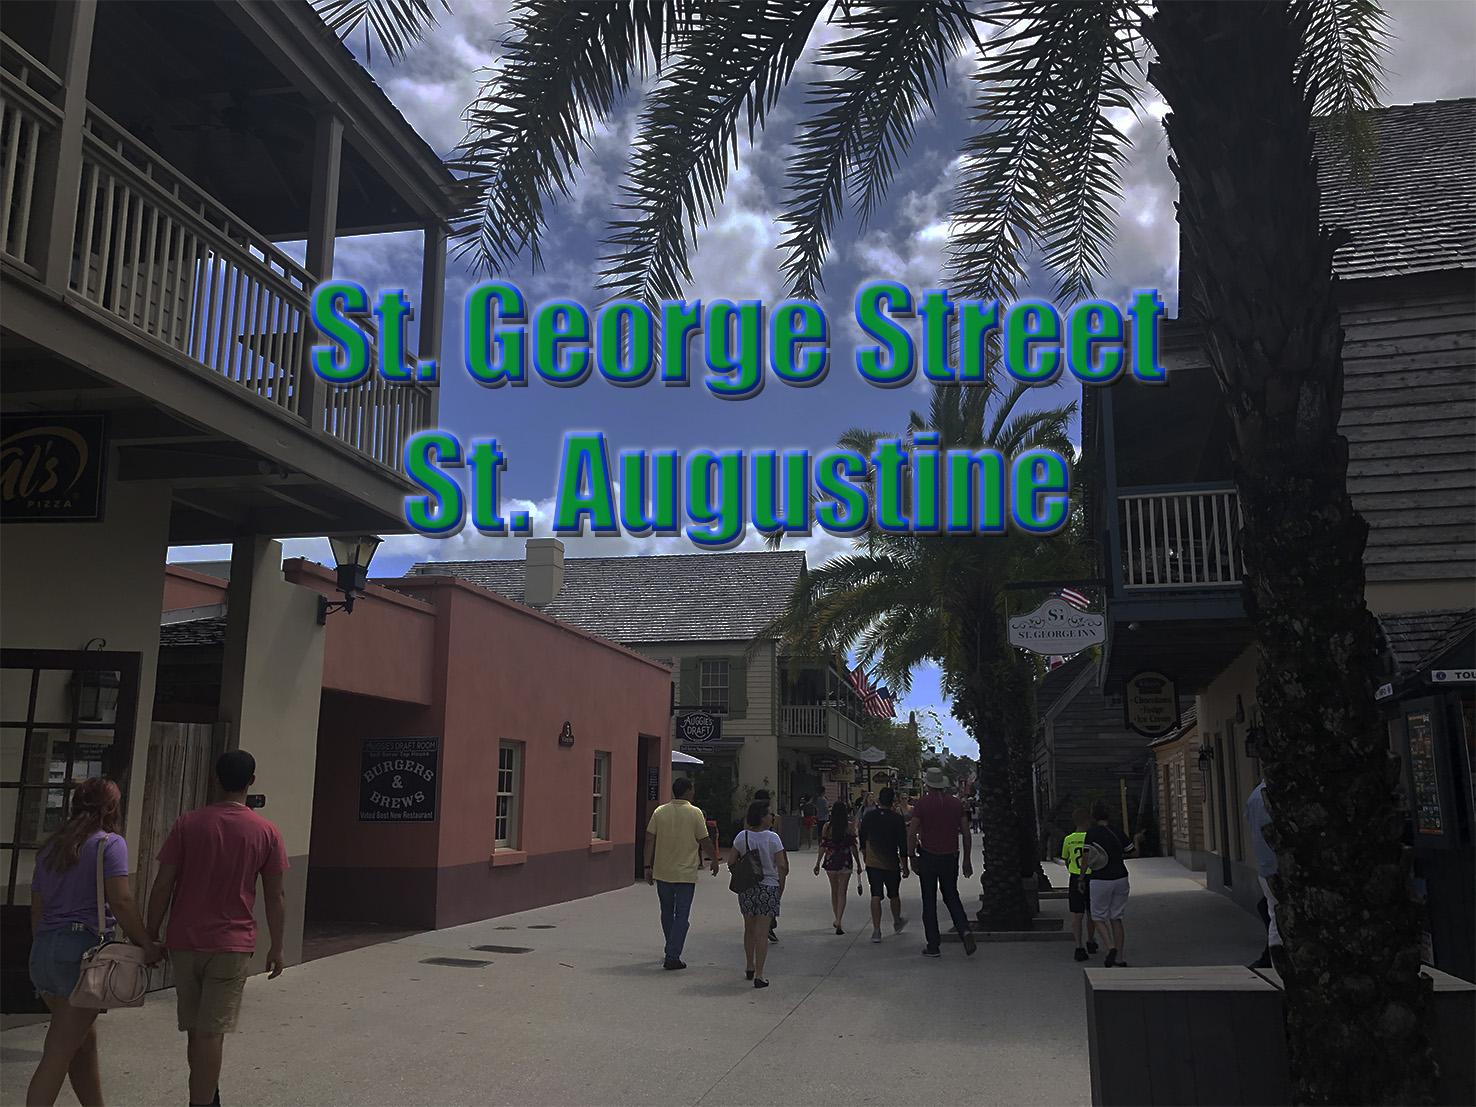 Caminando por St. George Street